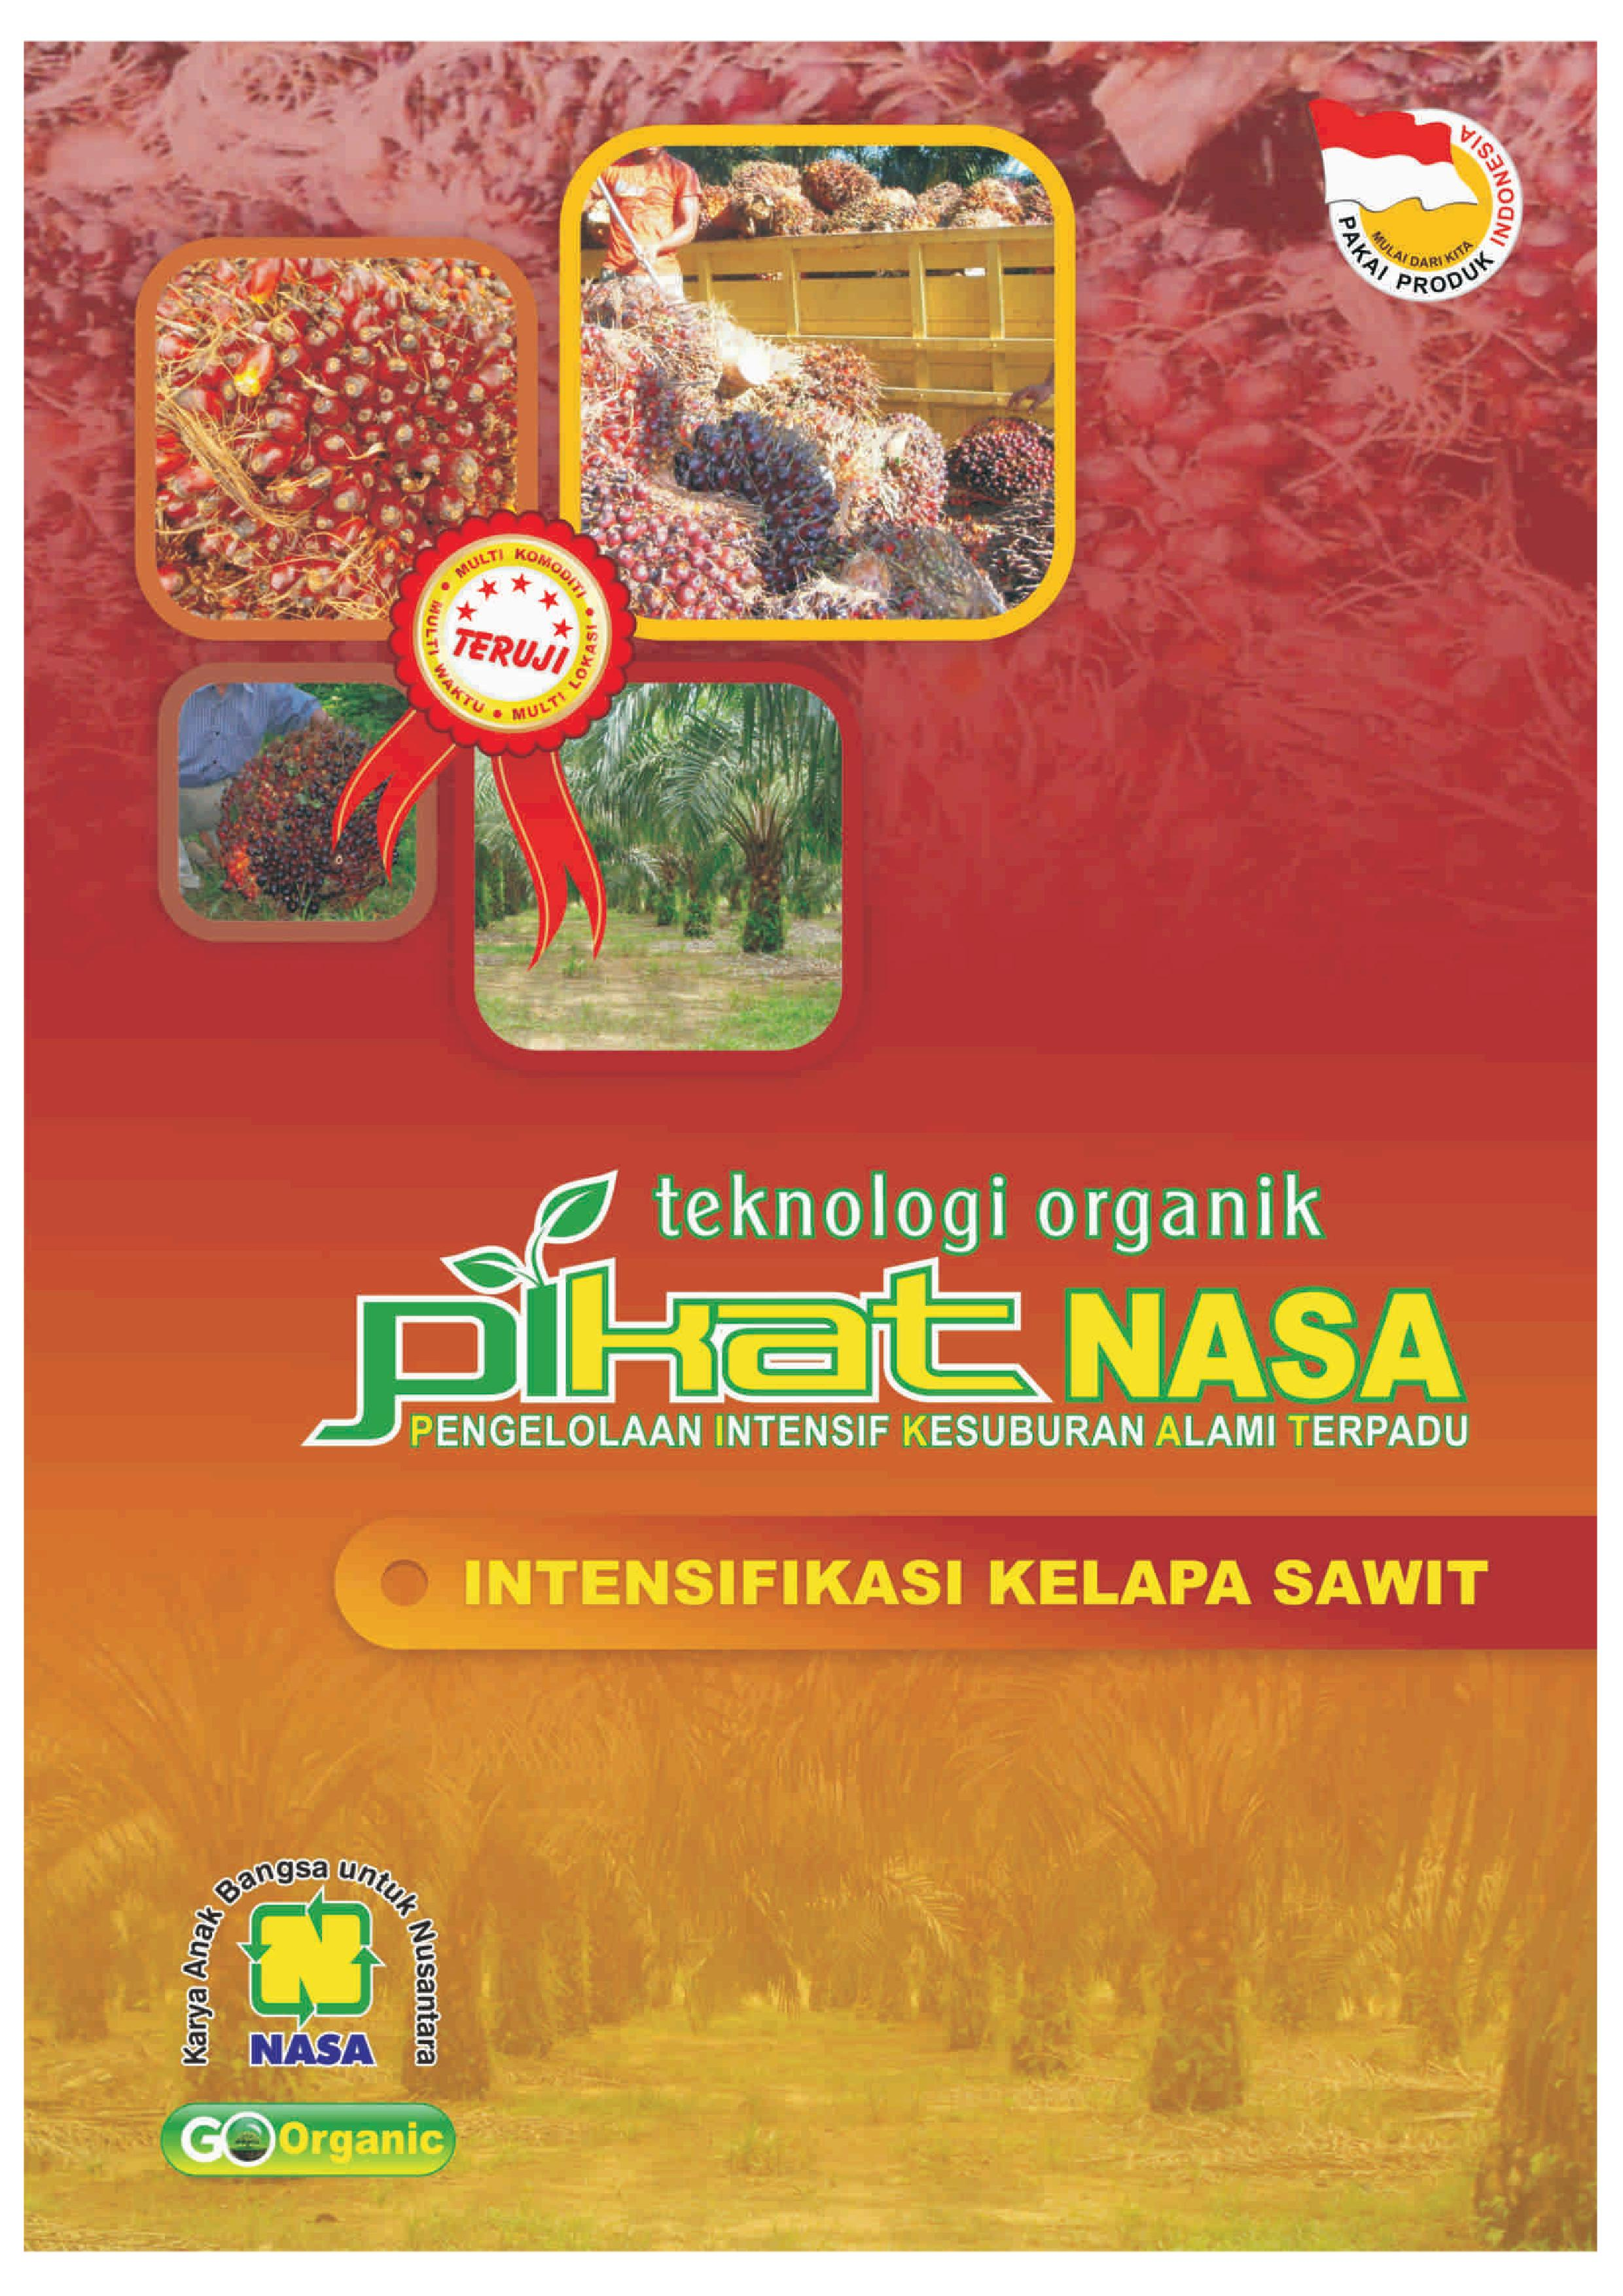 proposal-sawit-pt-nasa-page-001